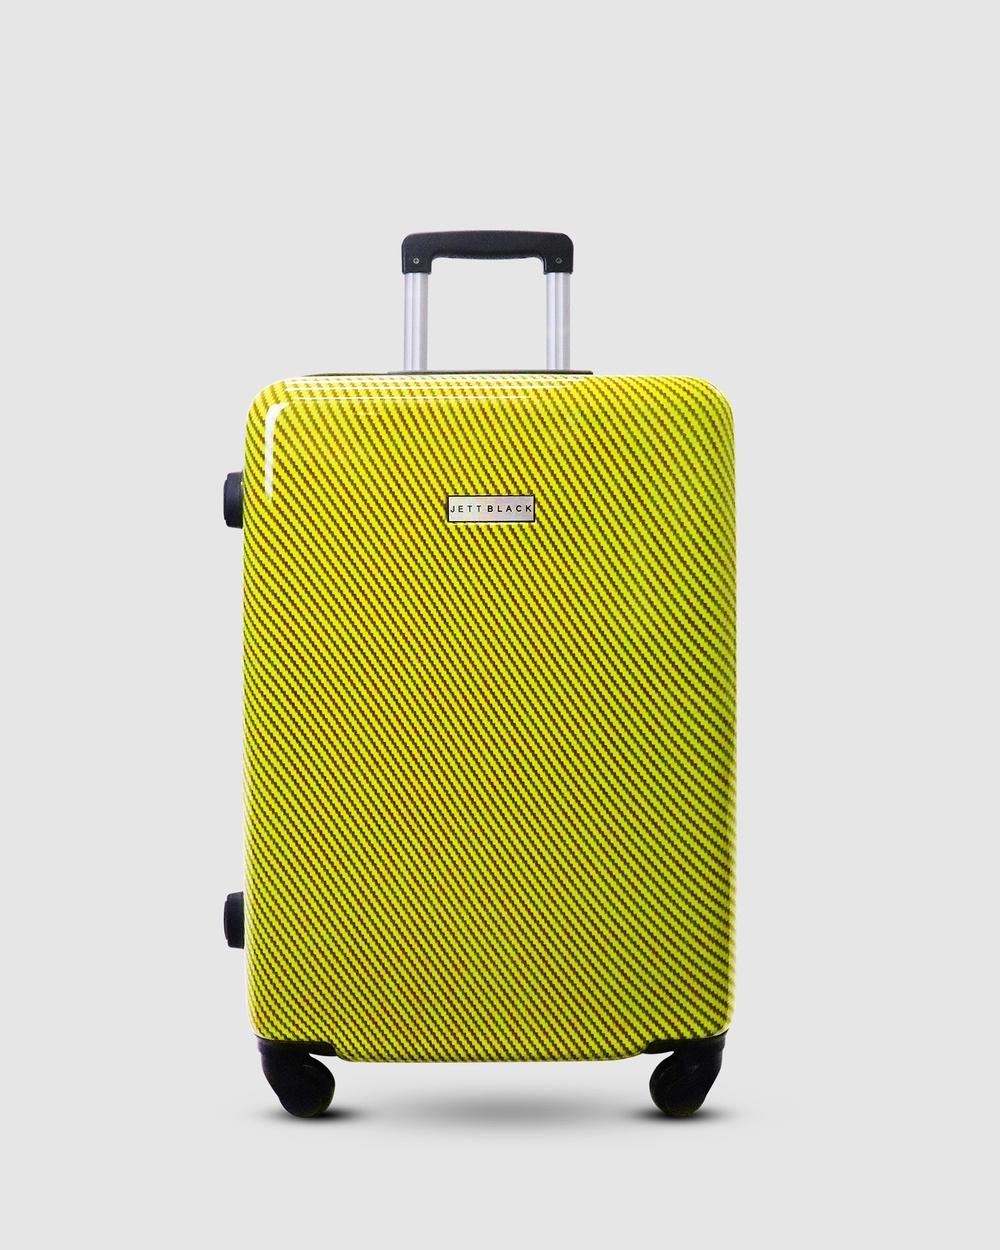 JETT BLACK Carbon Yellow Series Medium Suitcase Travel and Luggage Yellow